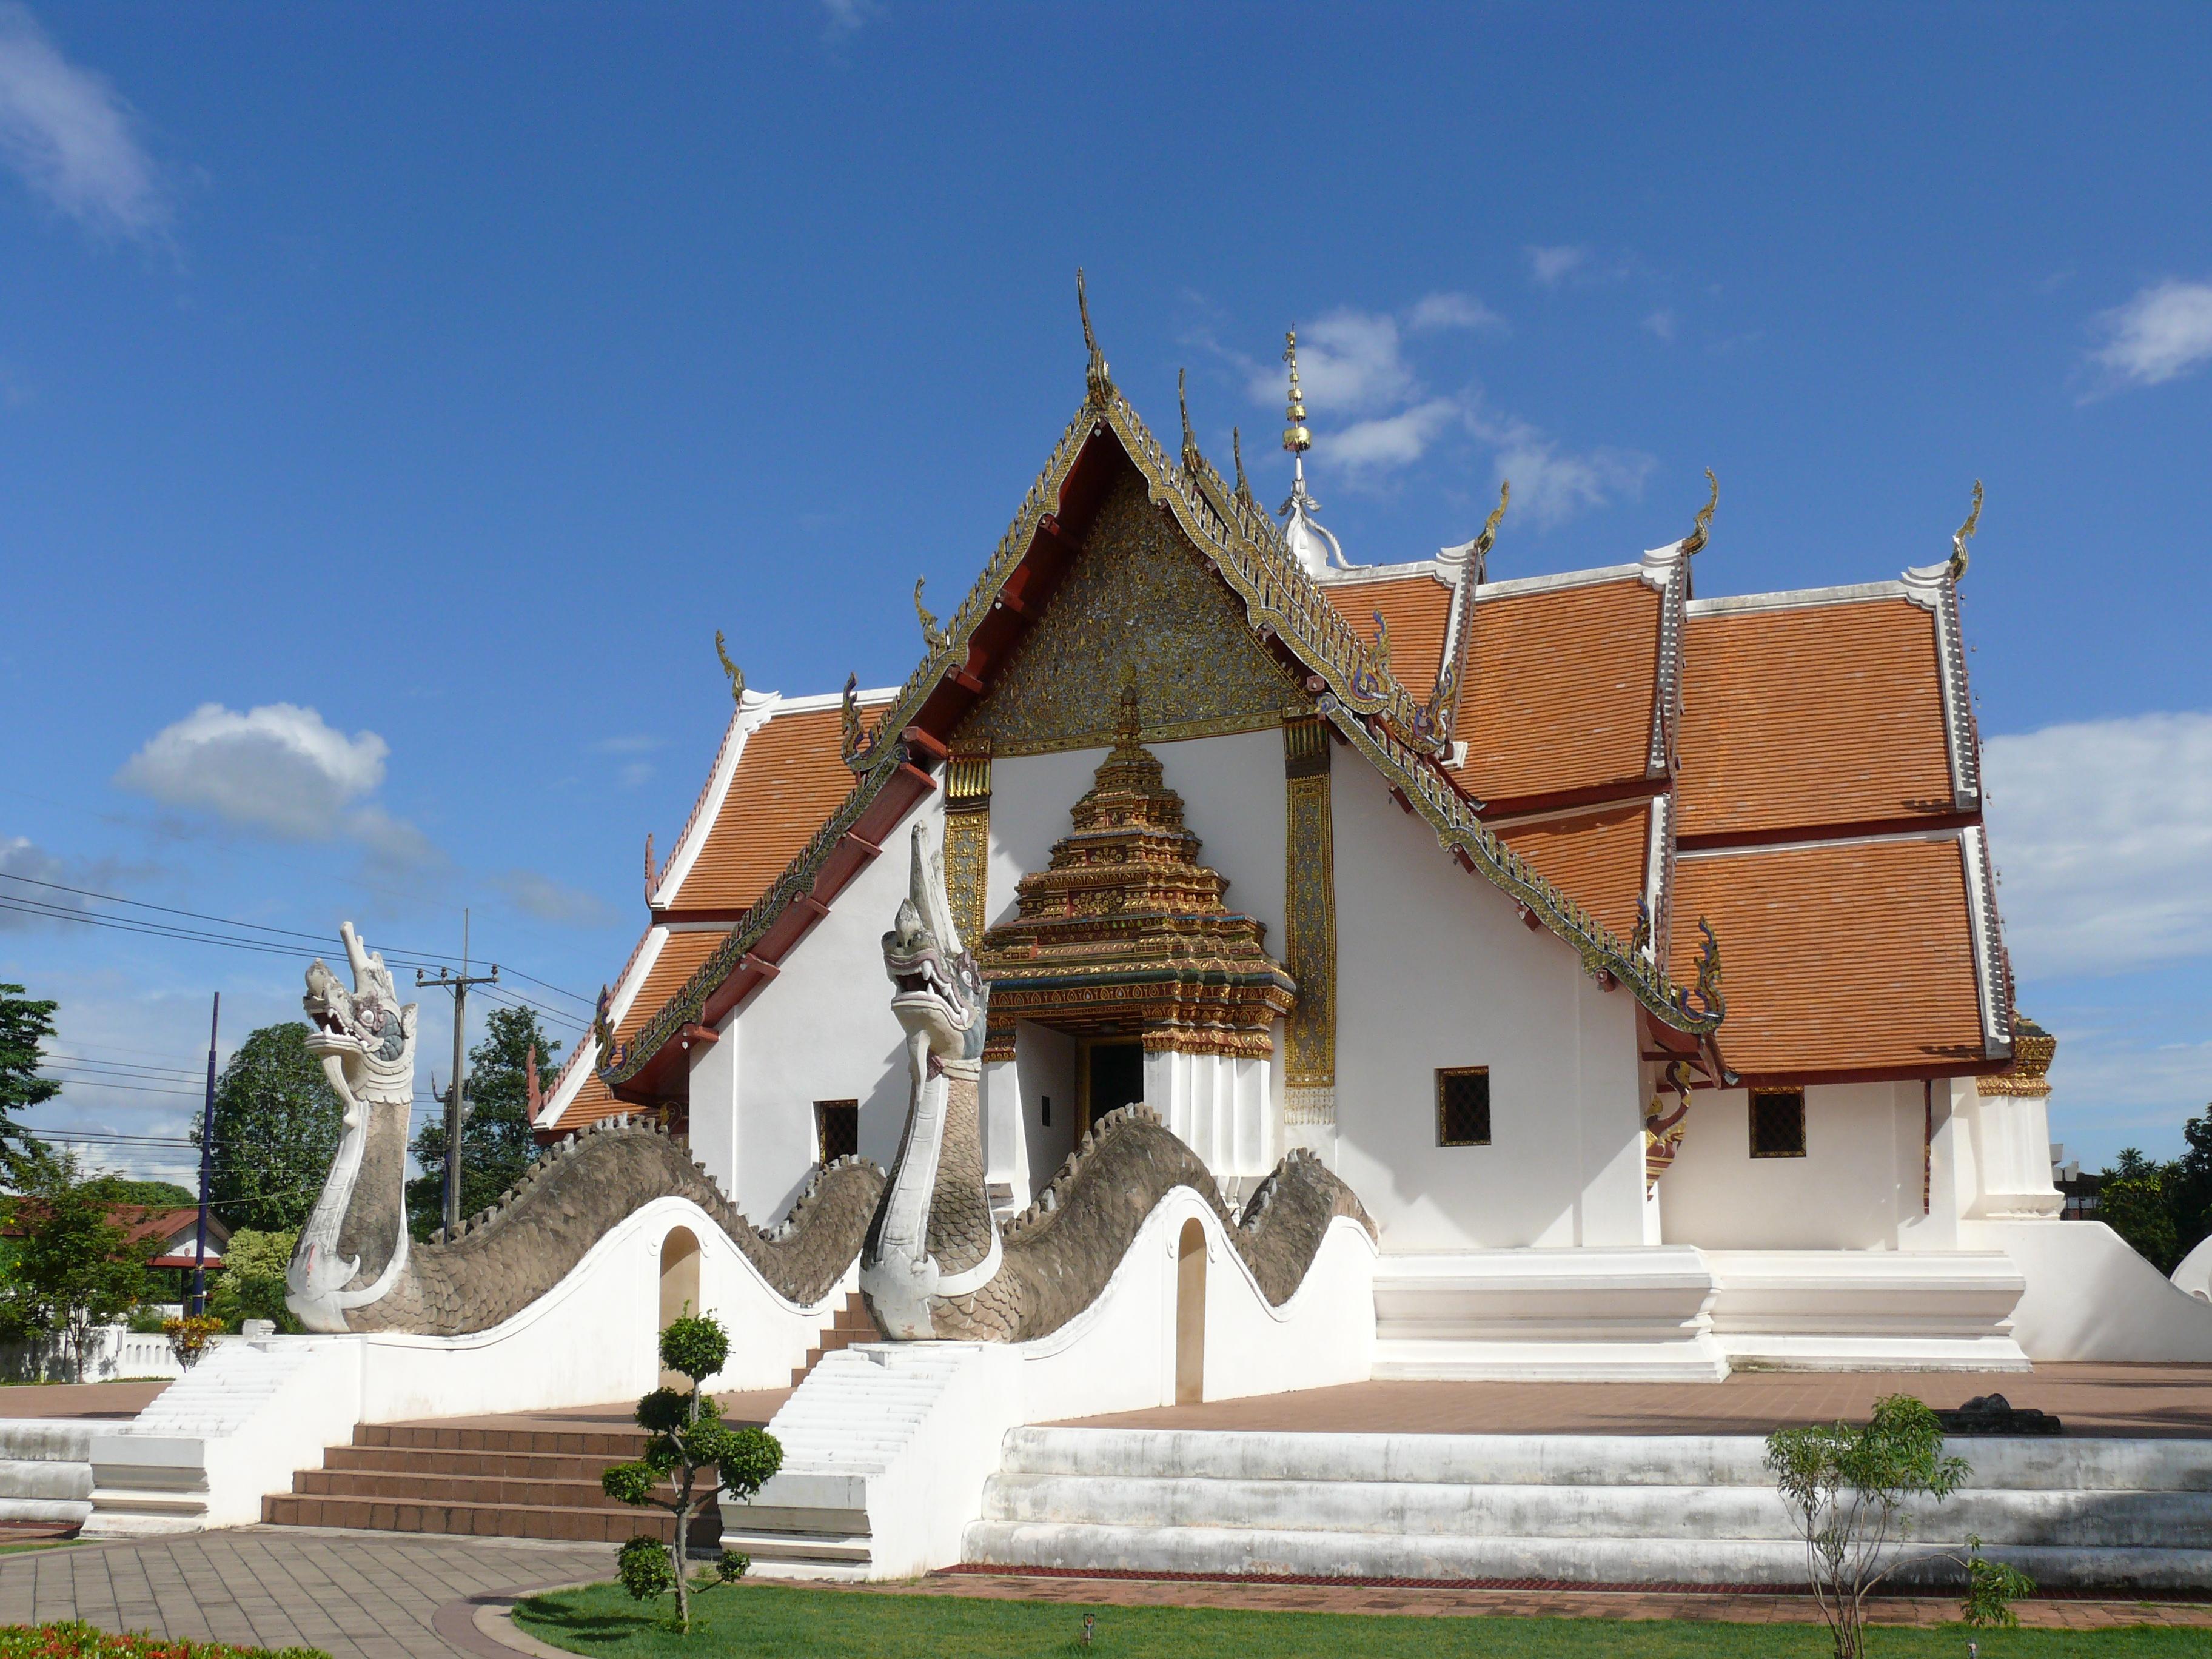 File:Wat Phumin devant, Nan.jpg - Wikimedia Commons